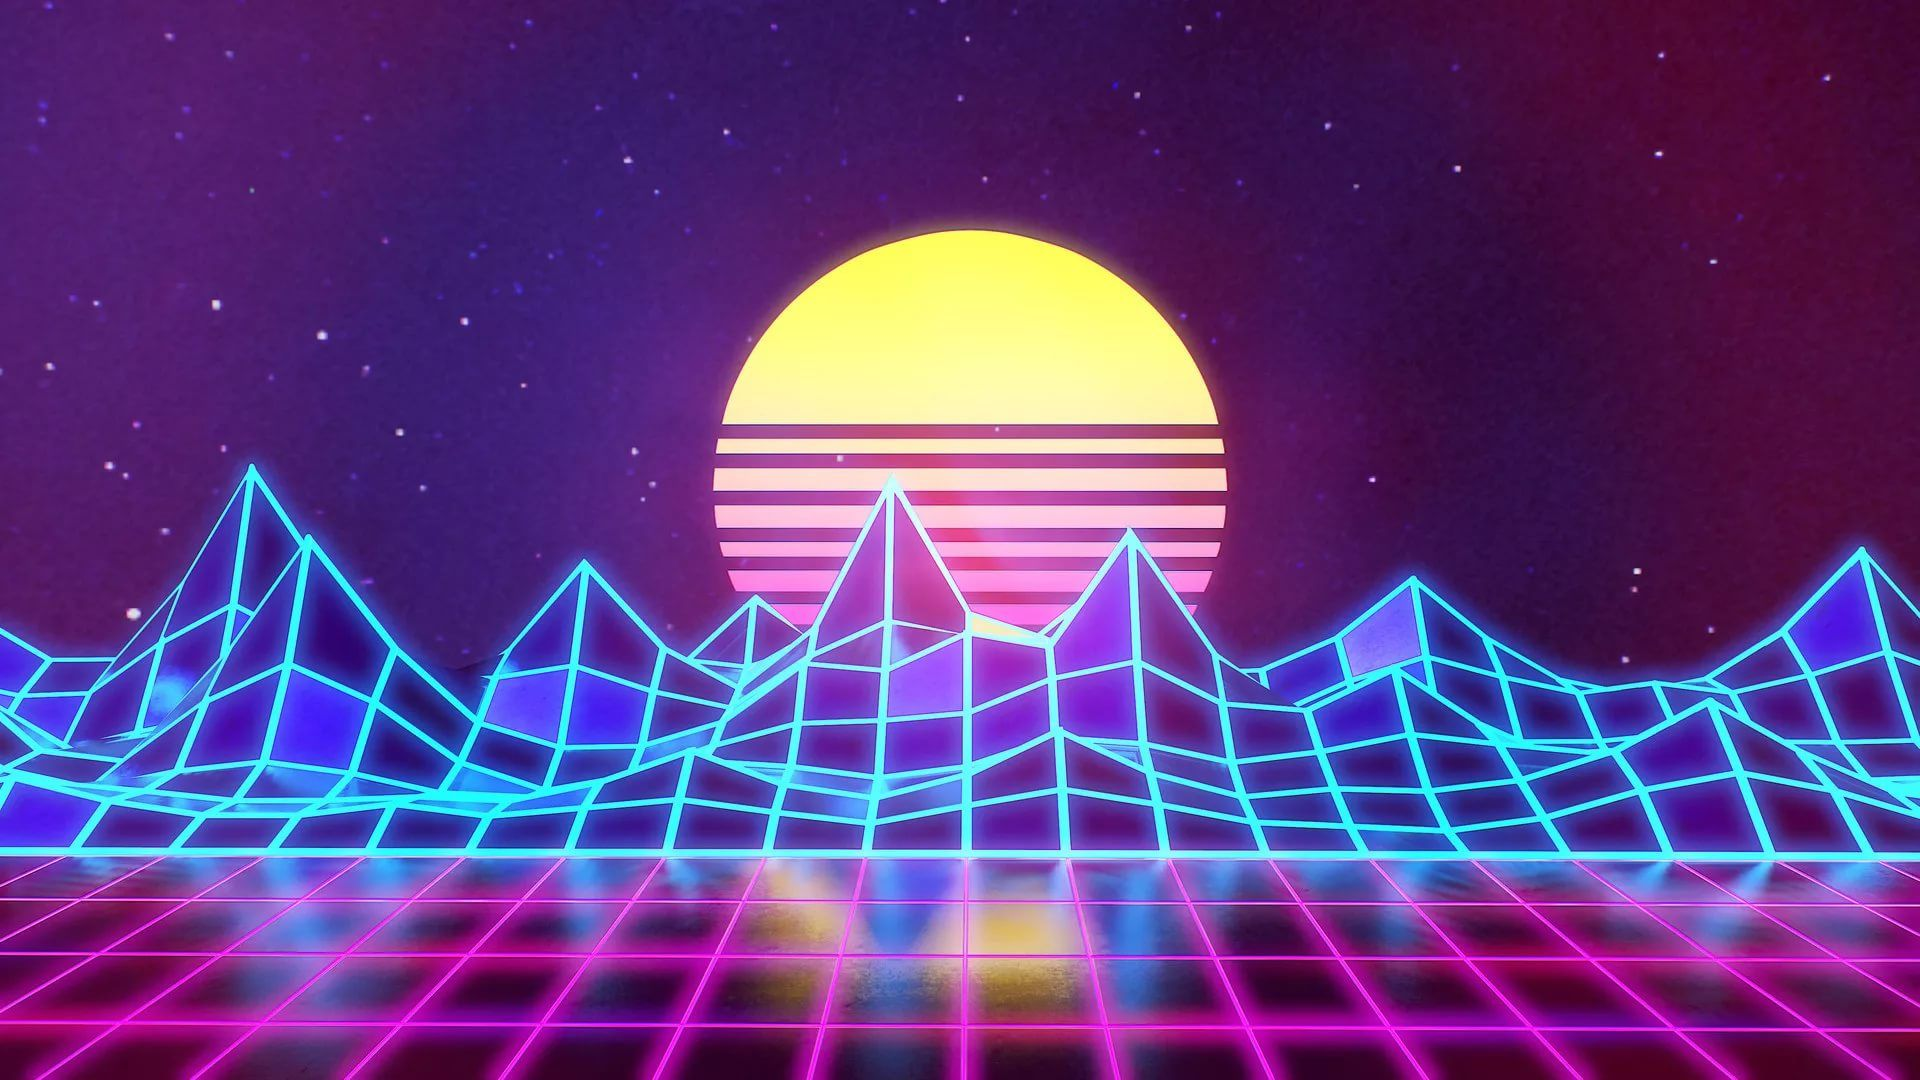 Synthwave desktop wallpaper download